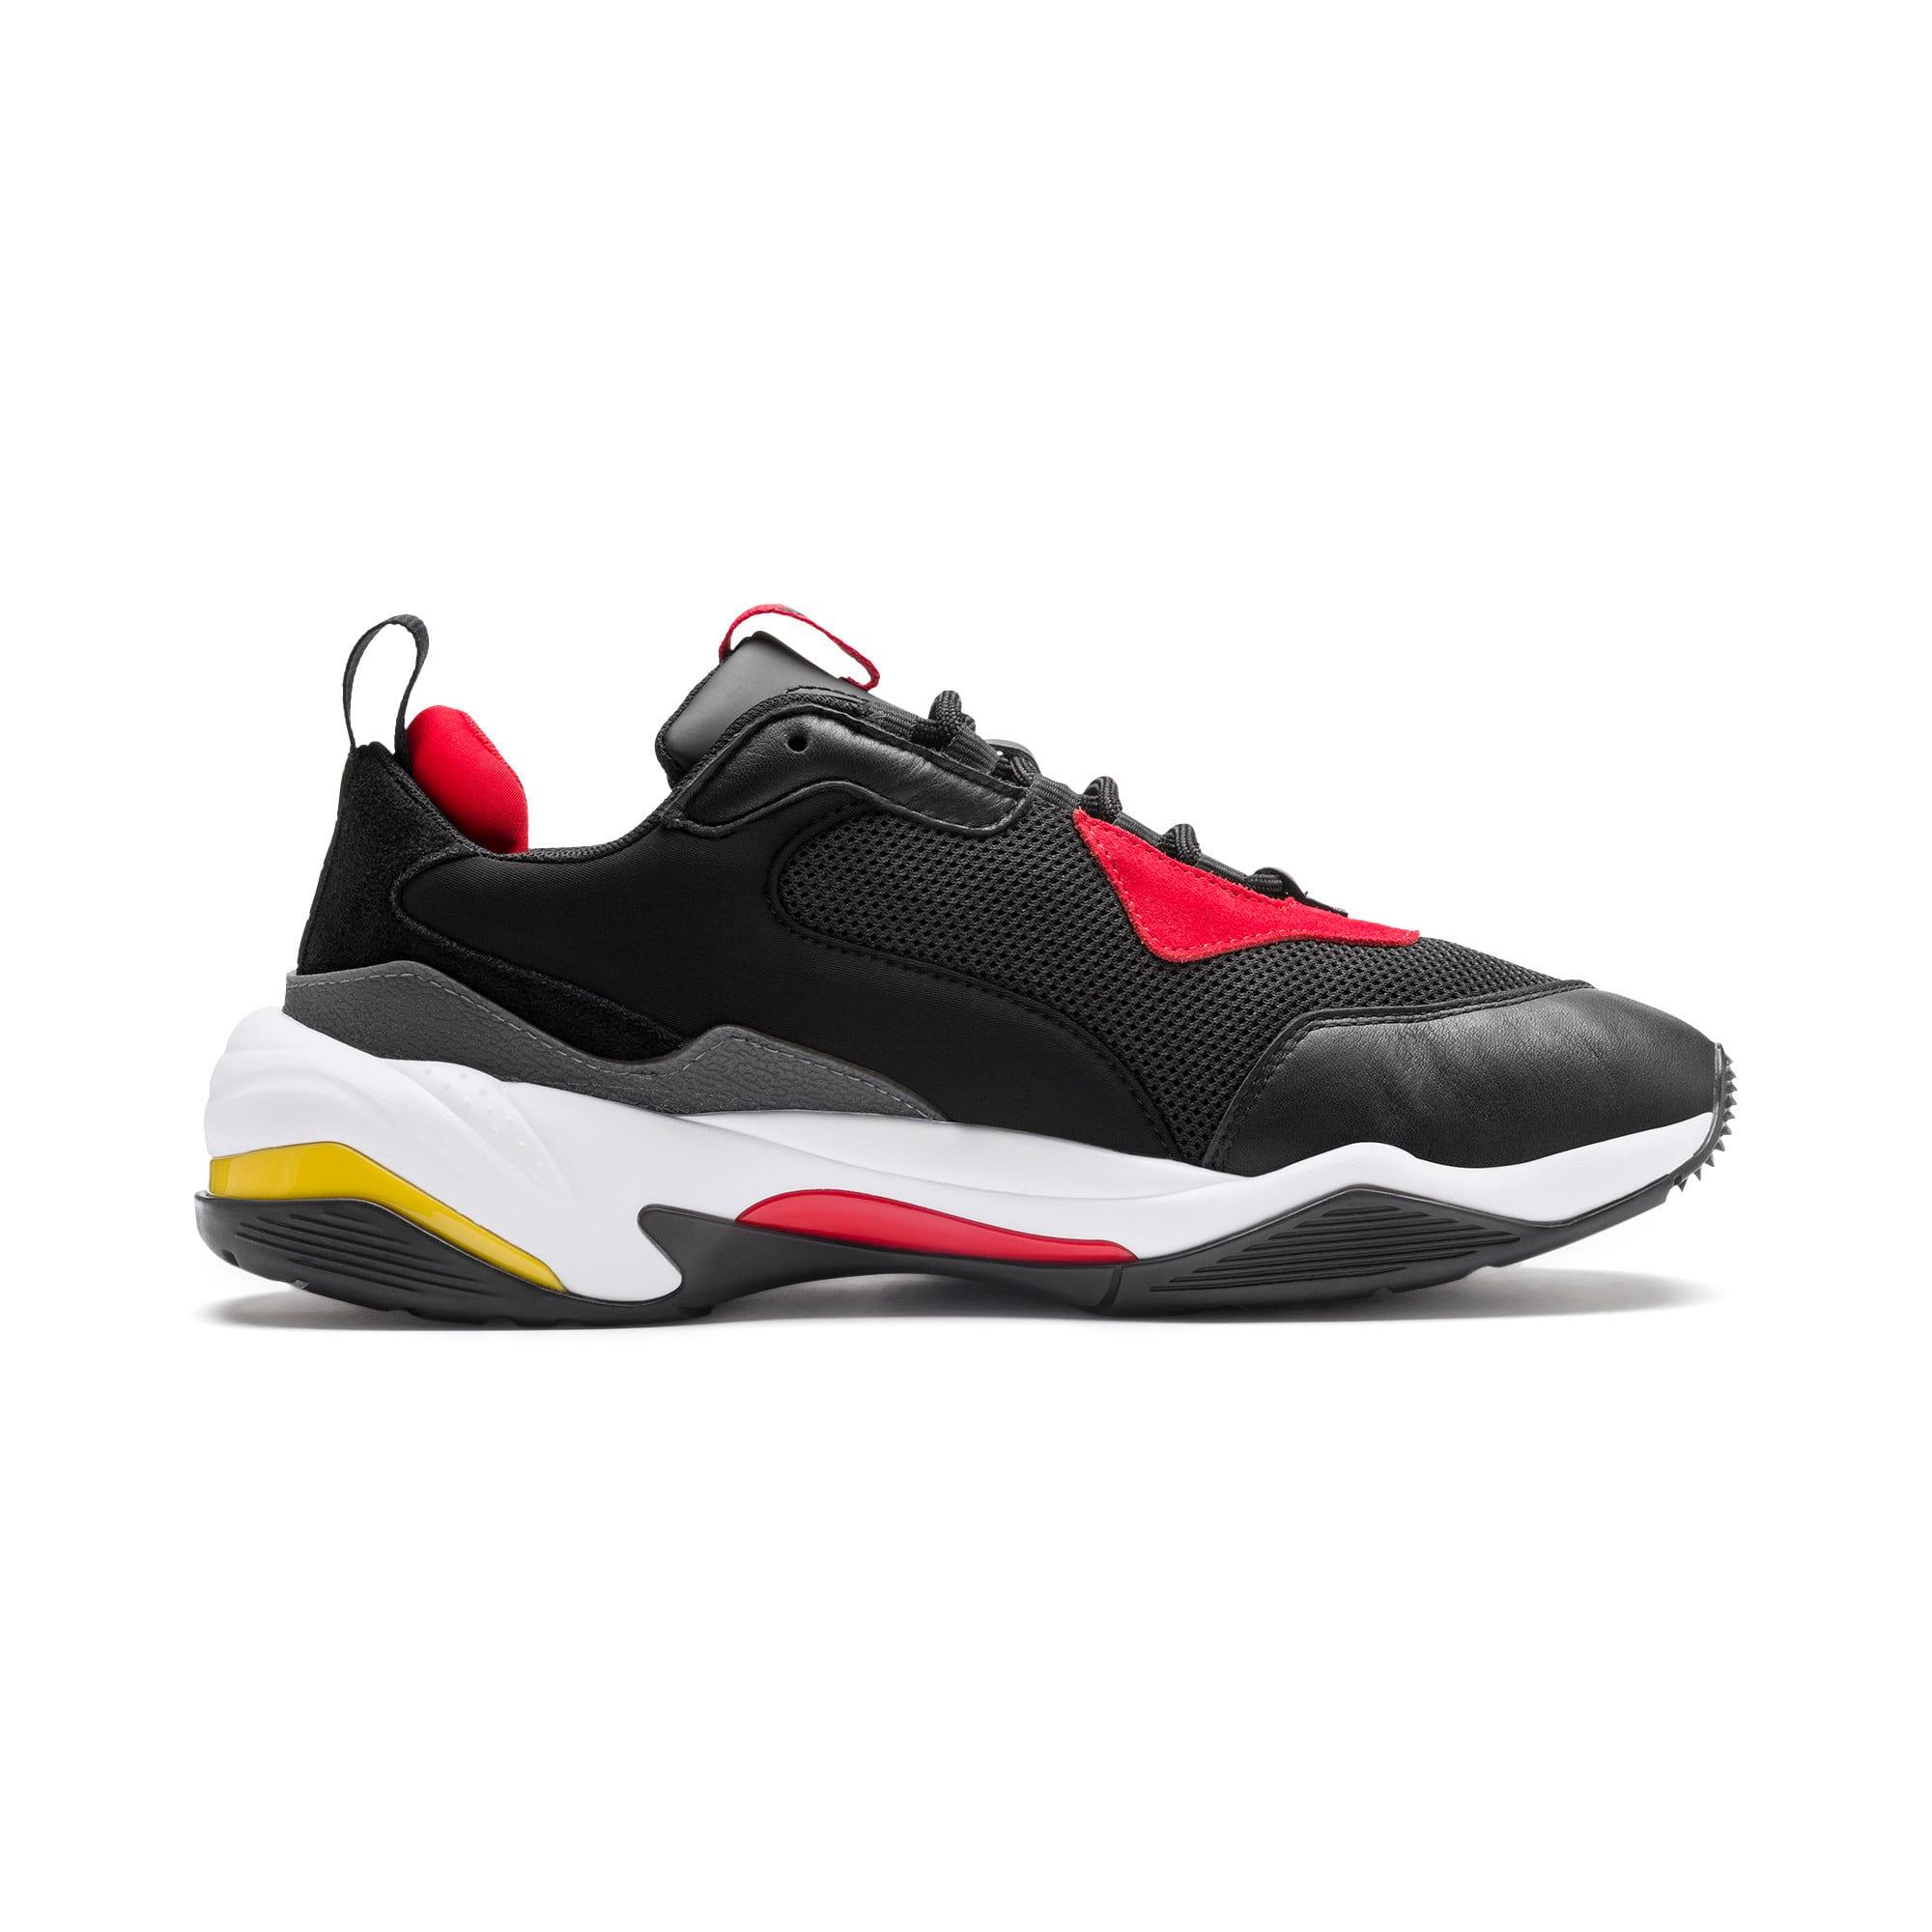 Thumbnail 5 of Ferrari Thunder Trainers, Puma Black-Rosso Corsa, medium